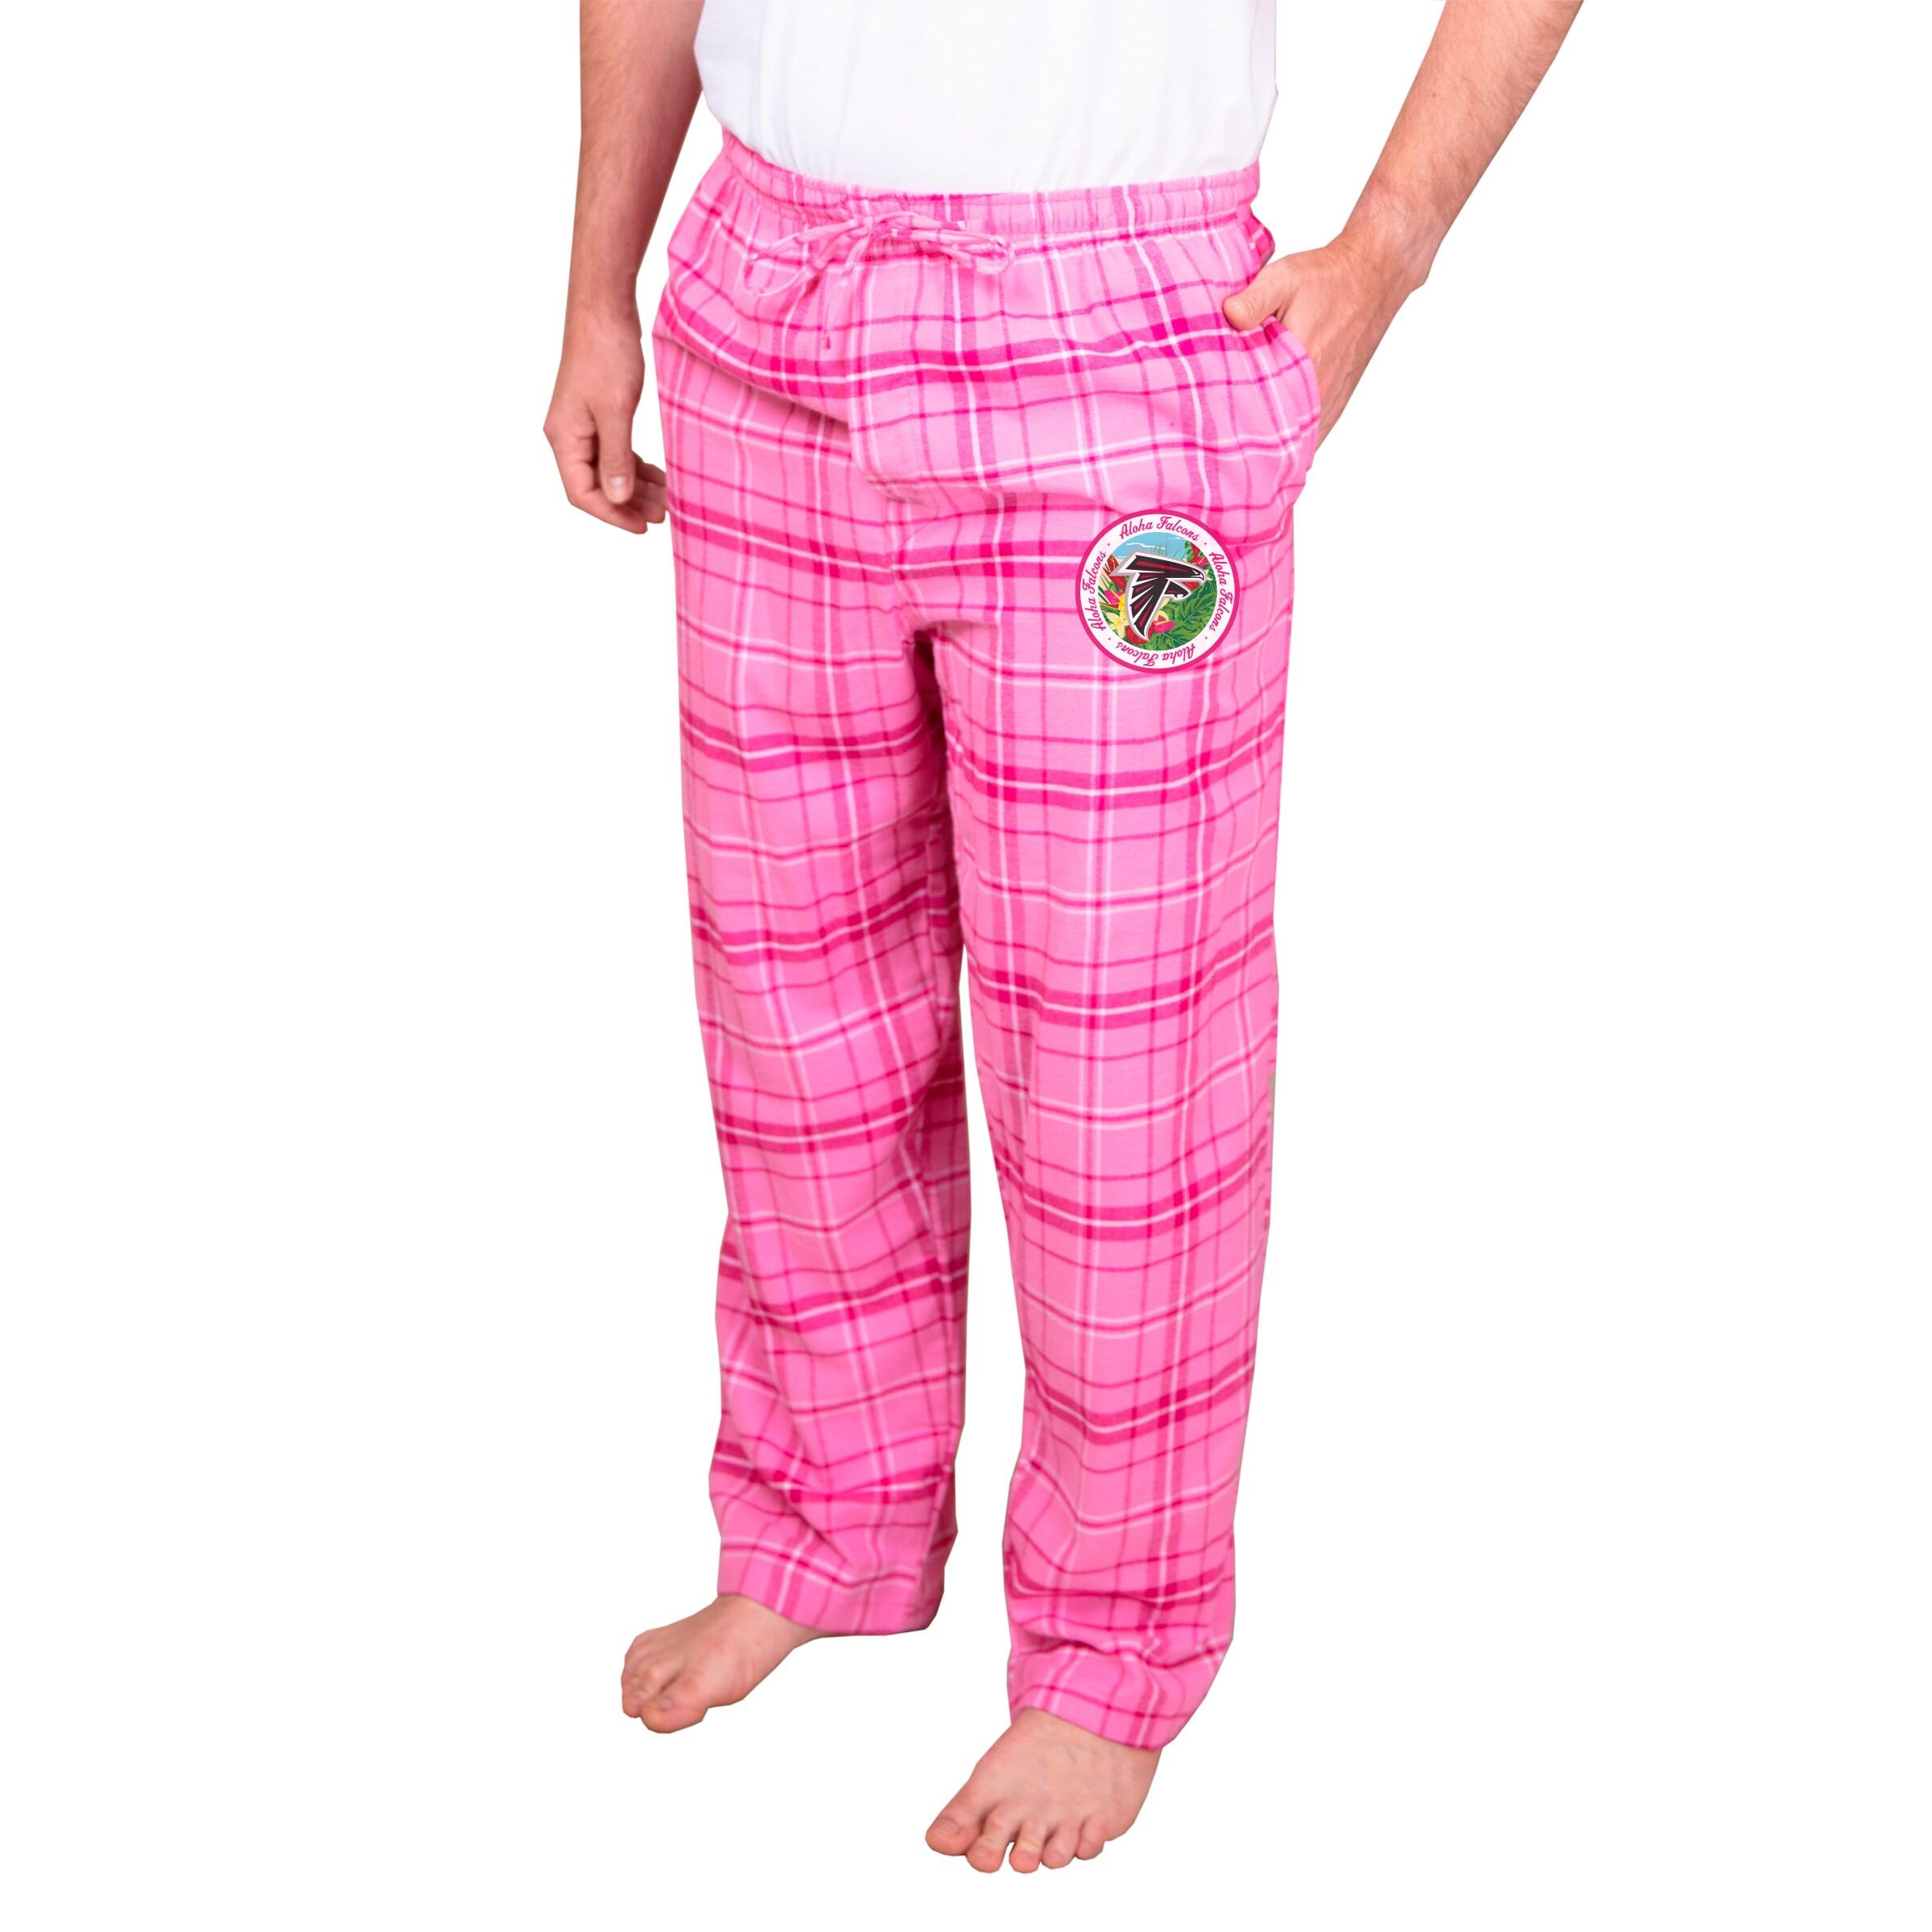 Atlanta Falcons Concepts Sport Ultimate Pants - Pink